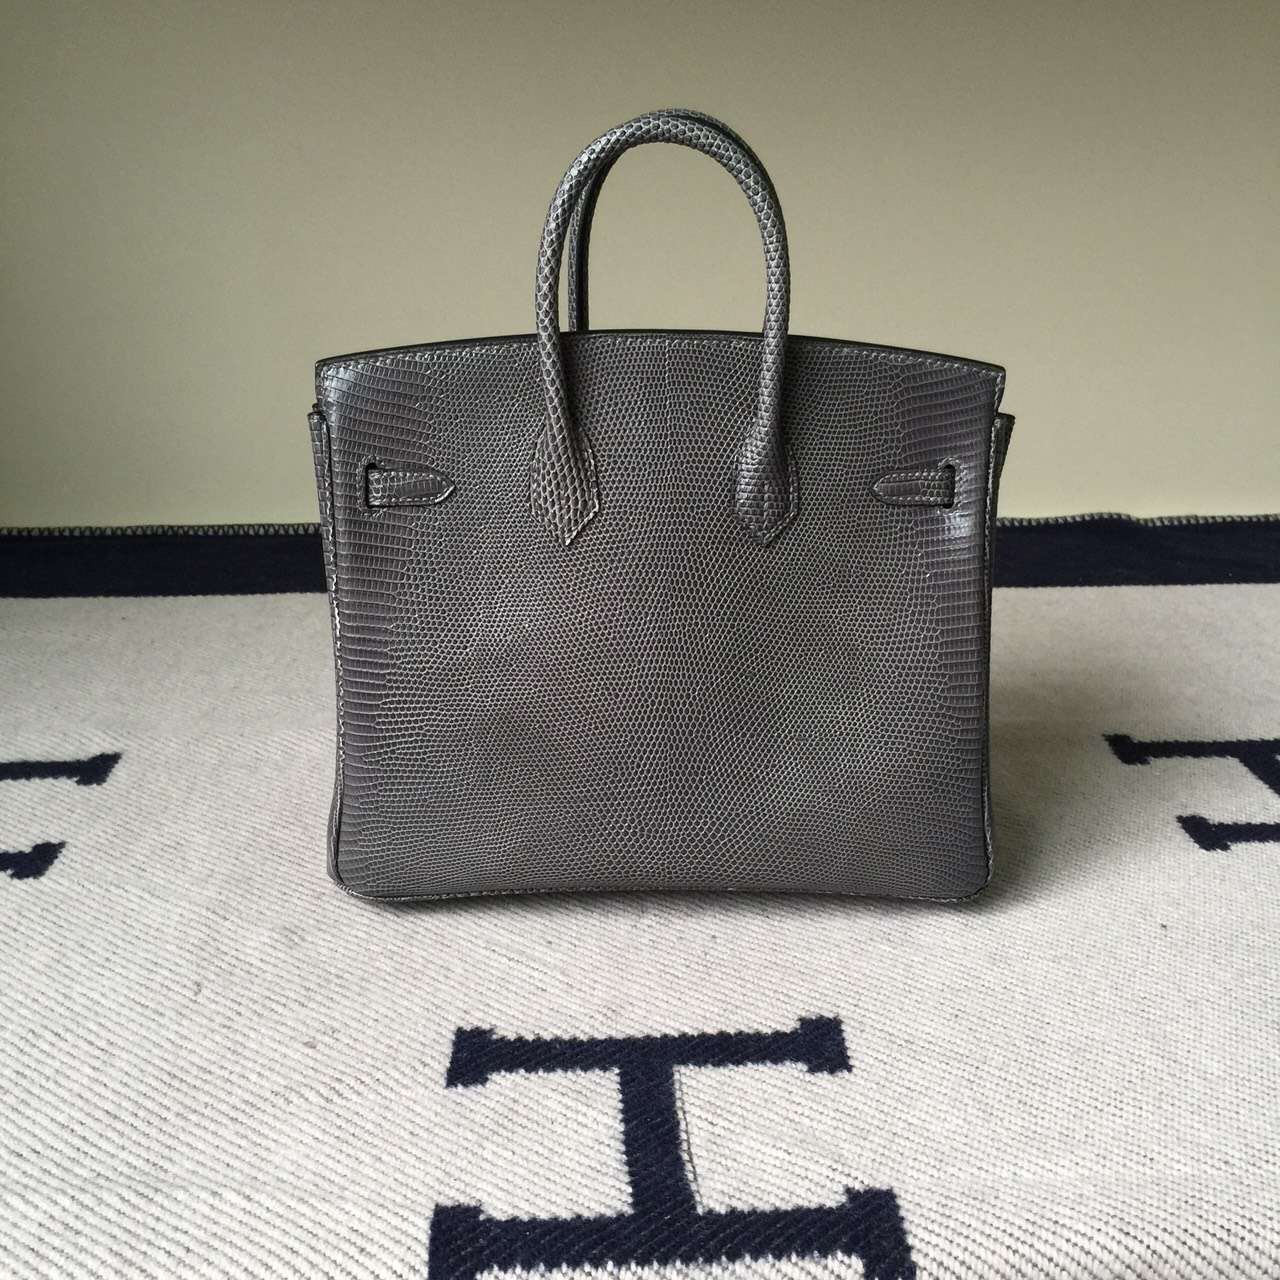 Hand Stitching Hermes Lizard Leather Birkin25cm Bag in Galaxy Grey